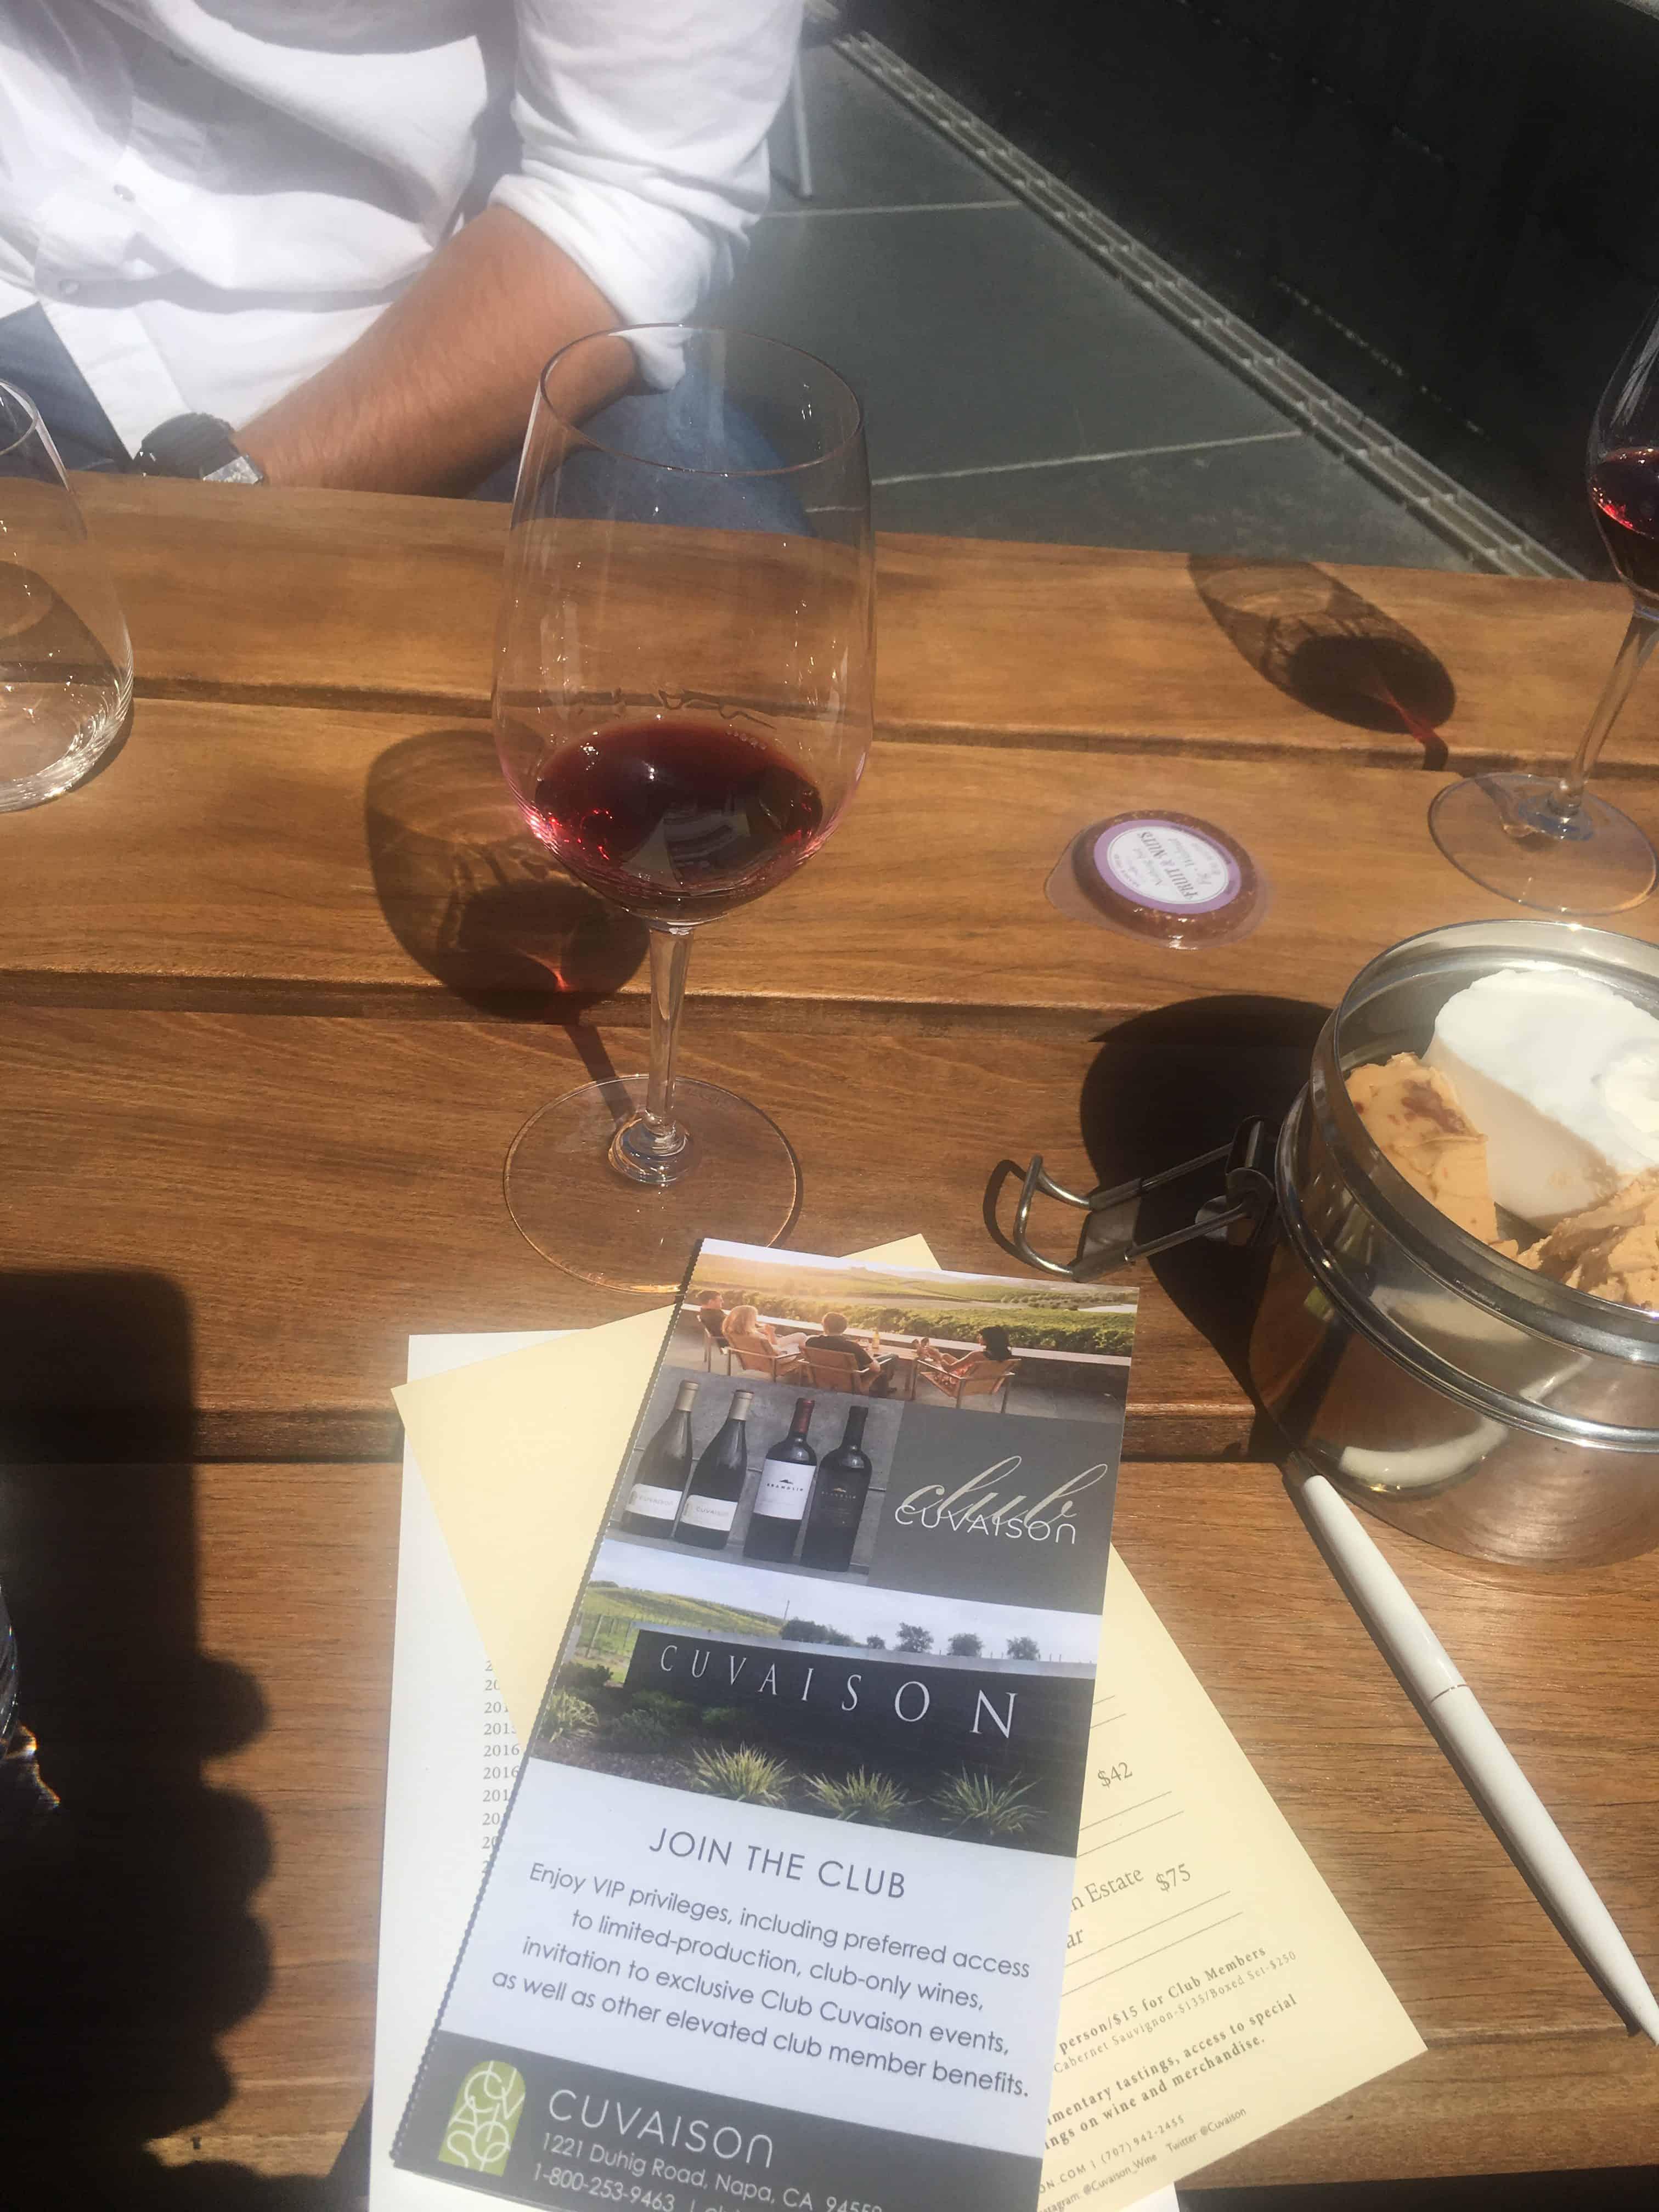 Wine tasting at Cuvaison in Napa. https://trimazing.com/